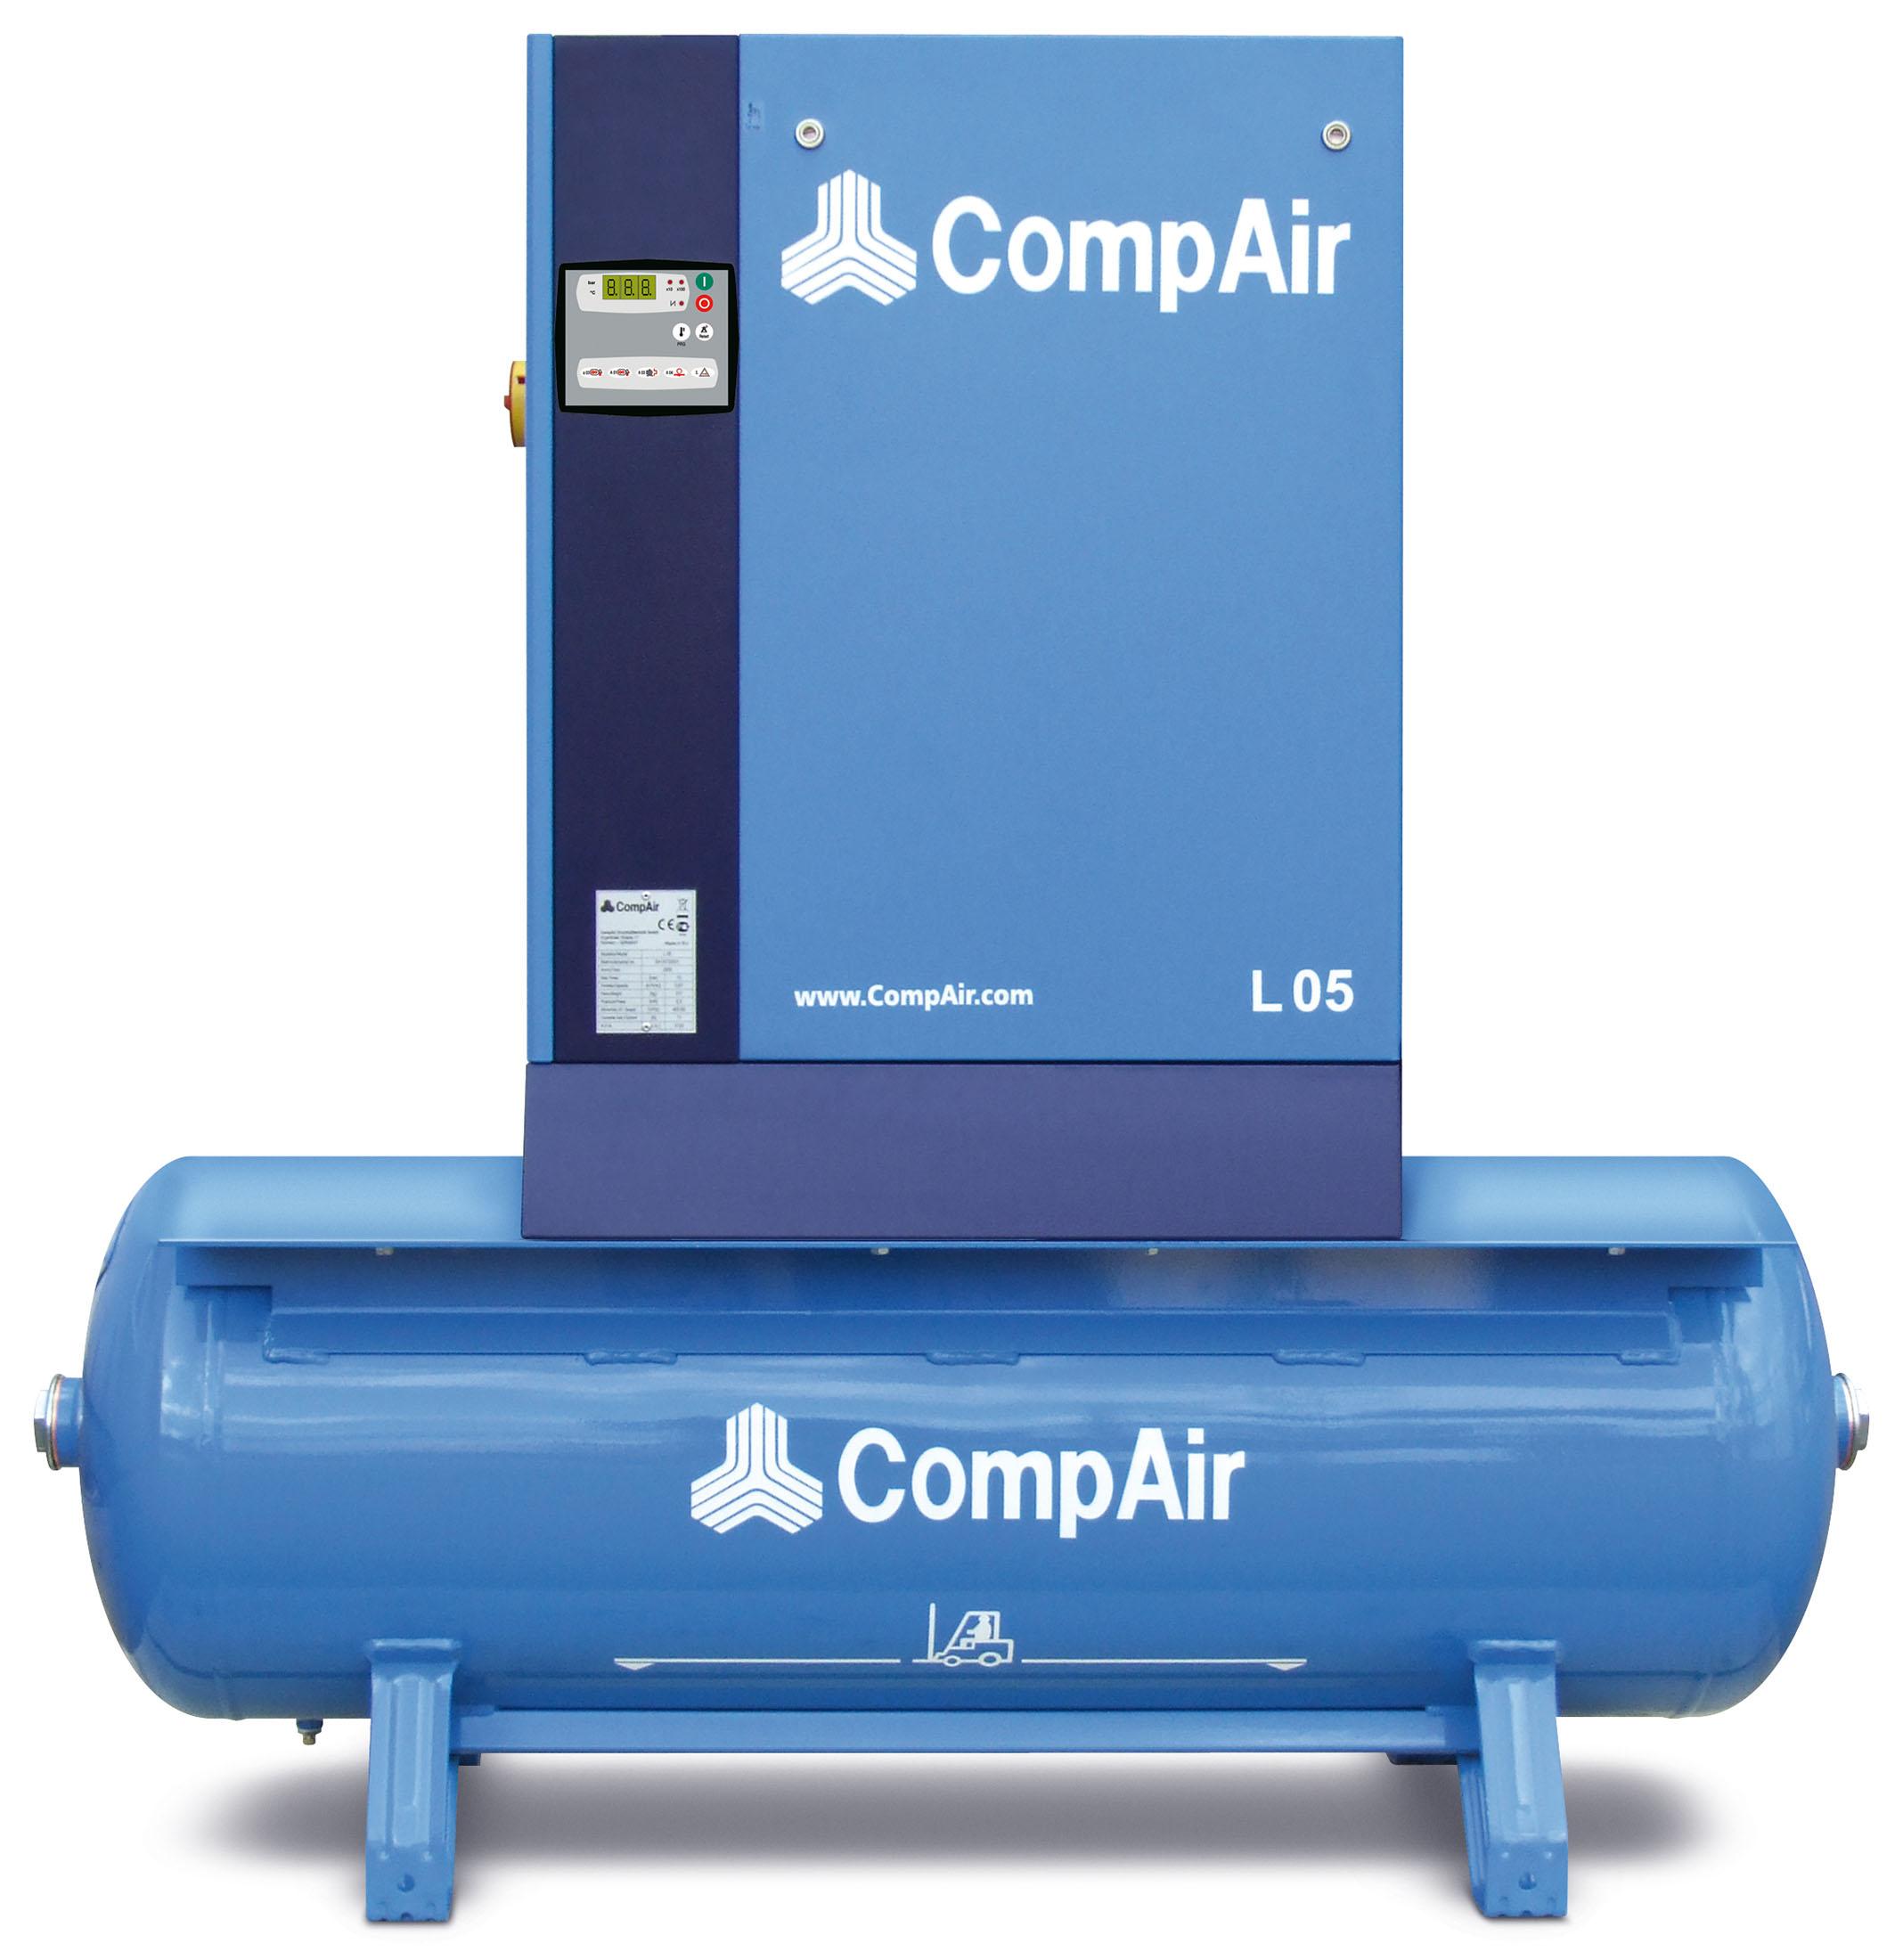 Midlands UK supplier of CompAir L05RM air compressor